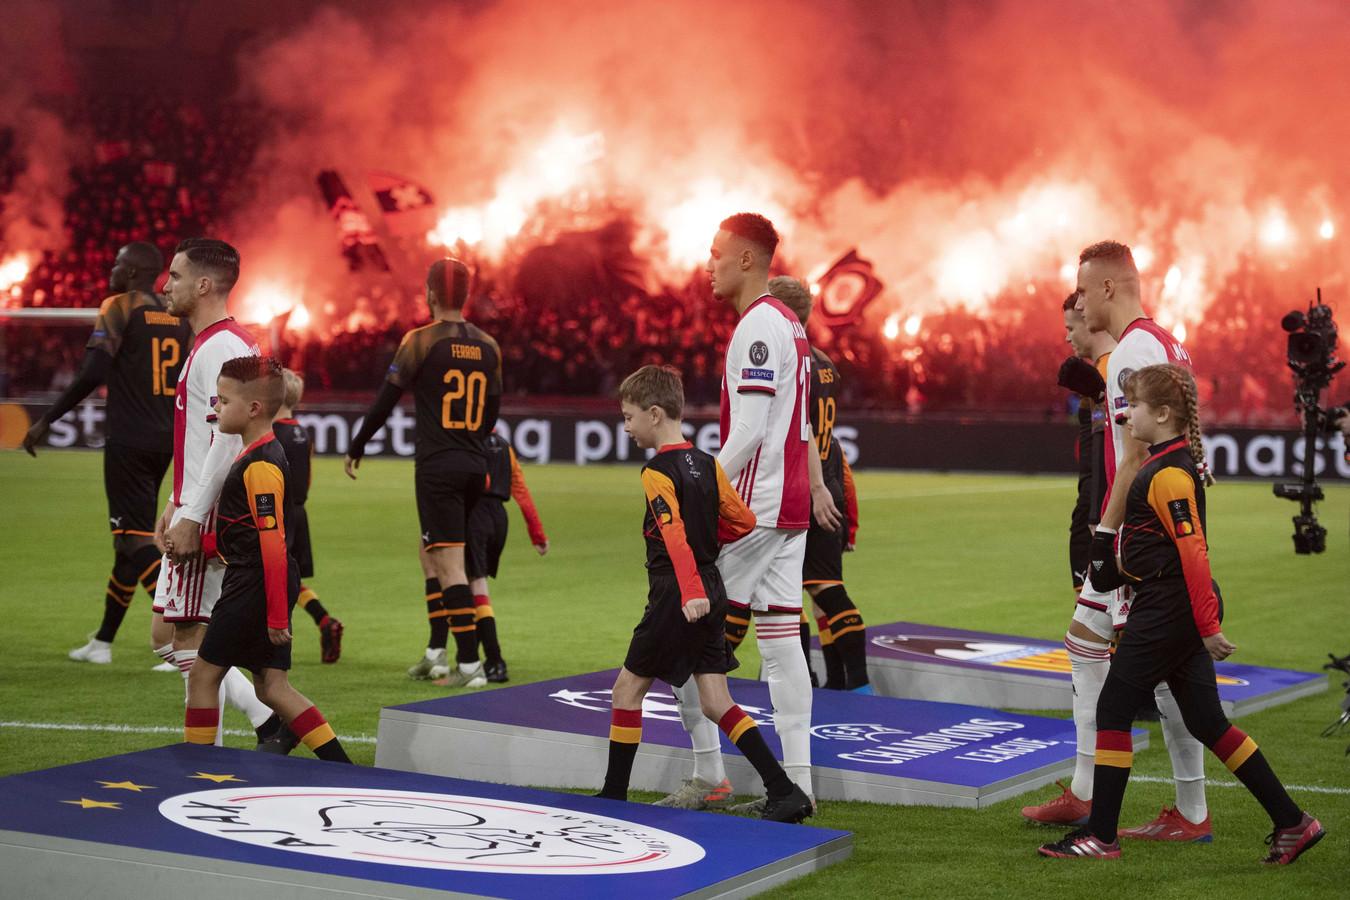 Ajax speelde dit seizoen namens Nederland in de Champions League.